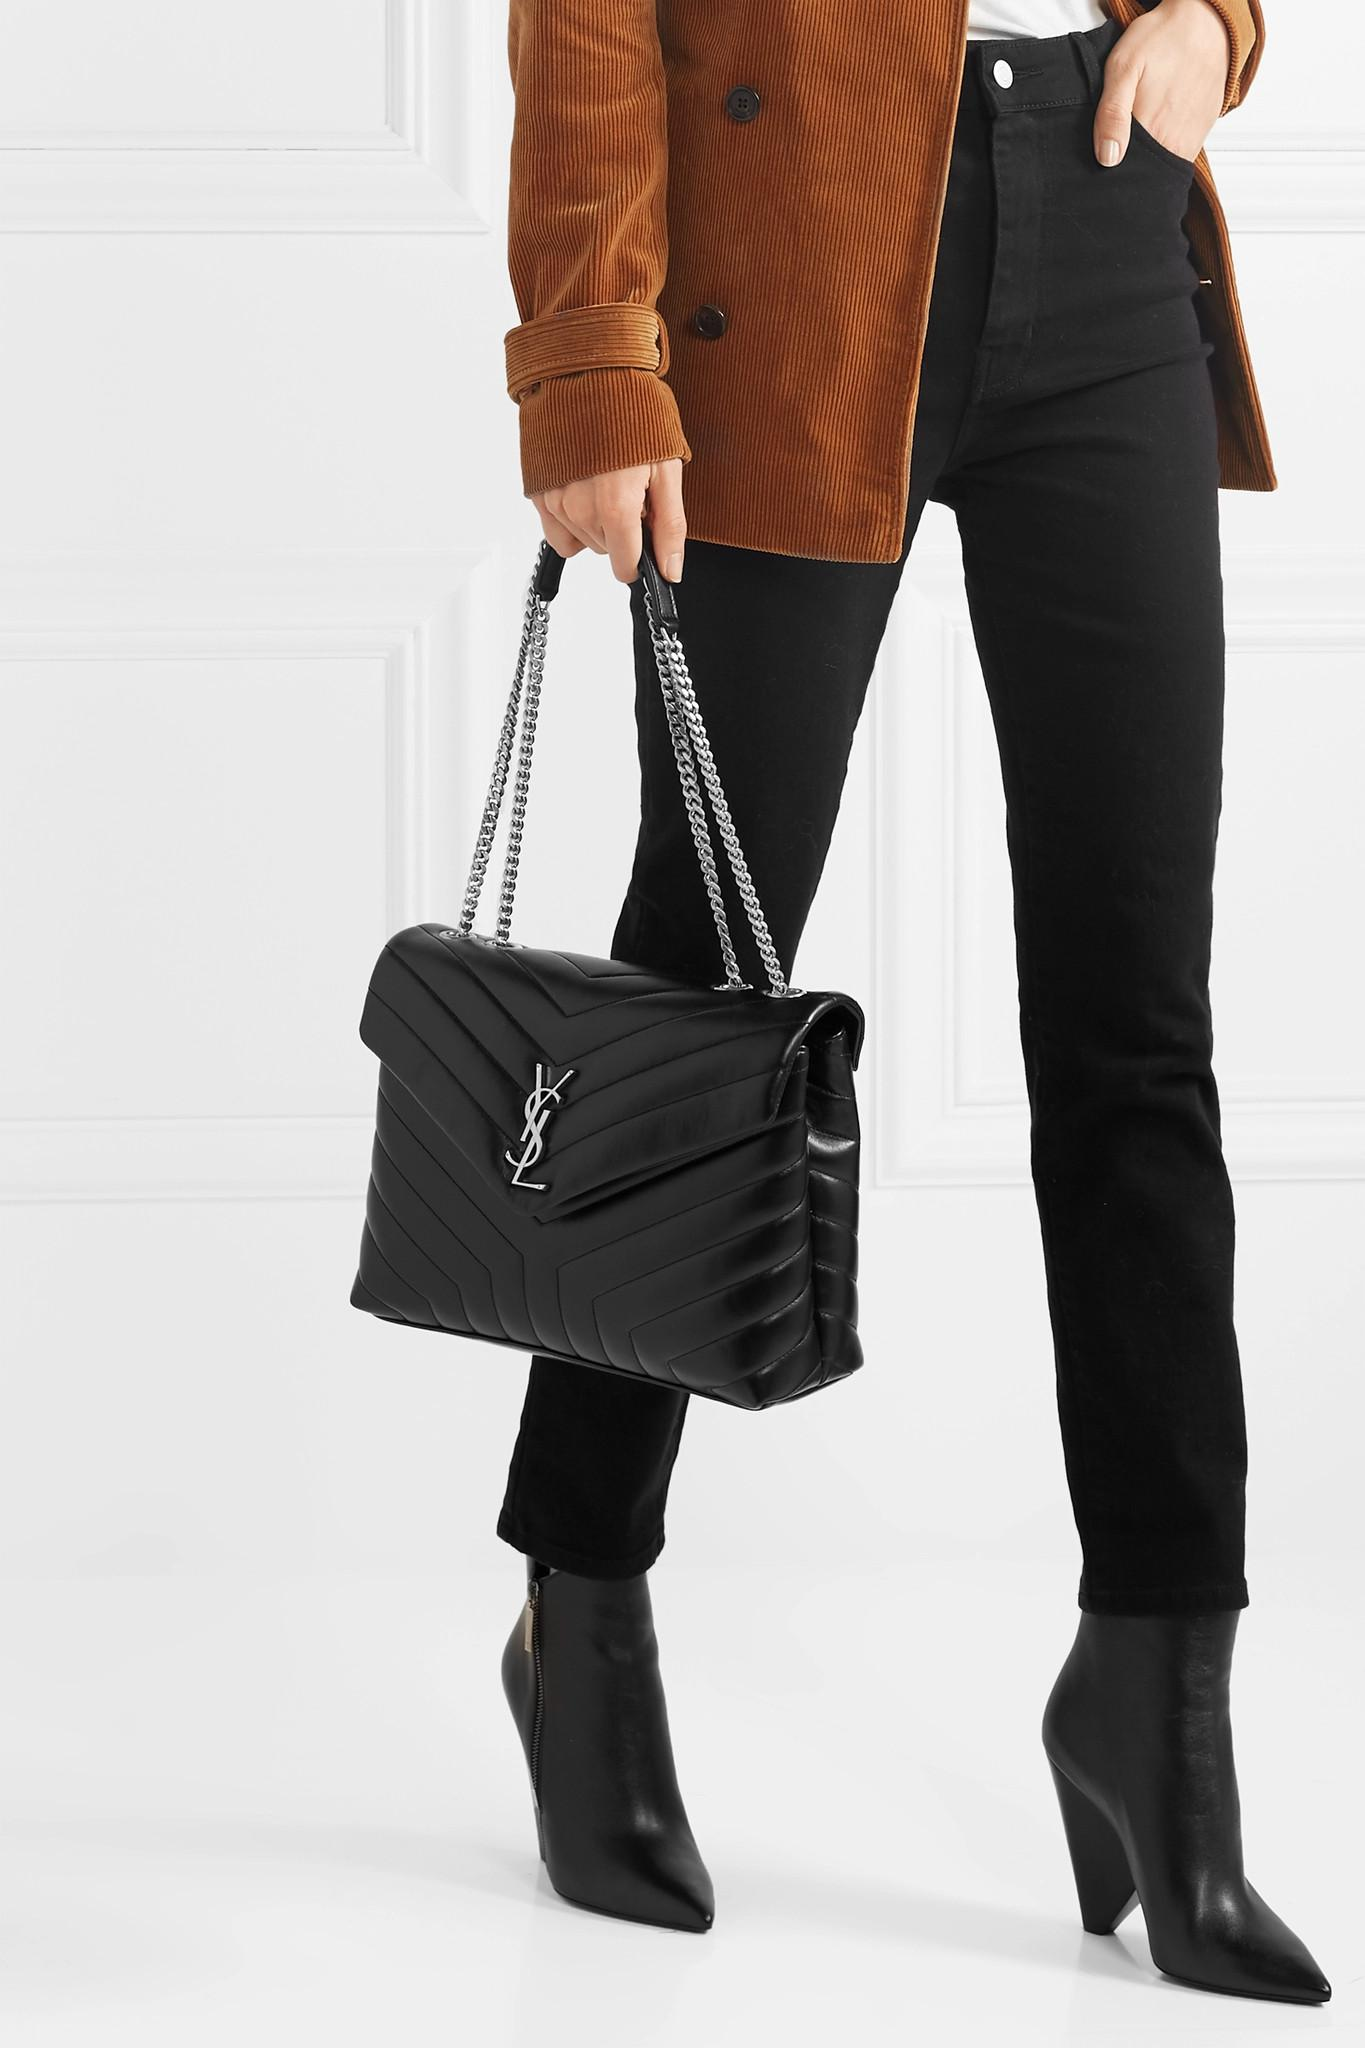 e1a2dbcc28a Saint Laurent - Black Loulou Medium Quilted Leather Shoulder Bag - Lyst.  View fullscreen